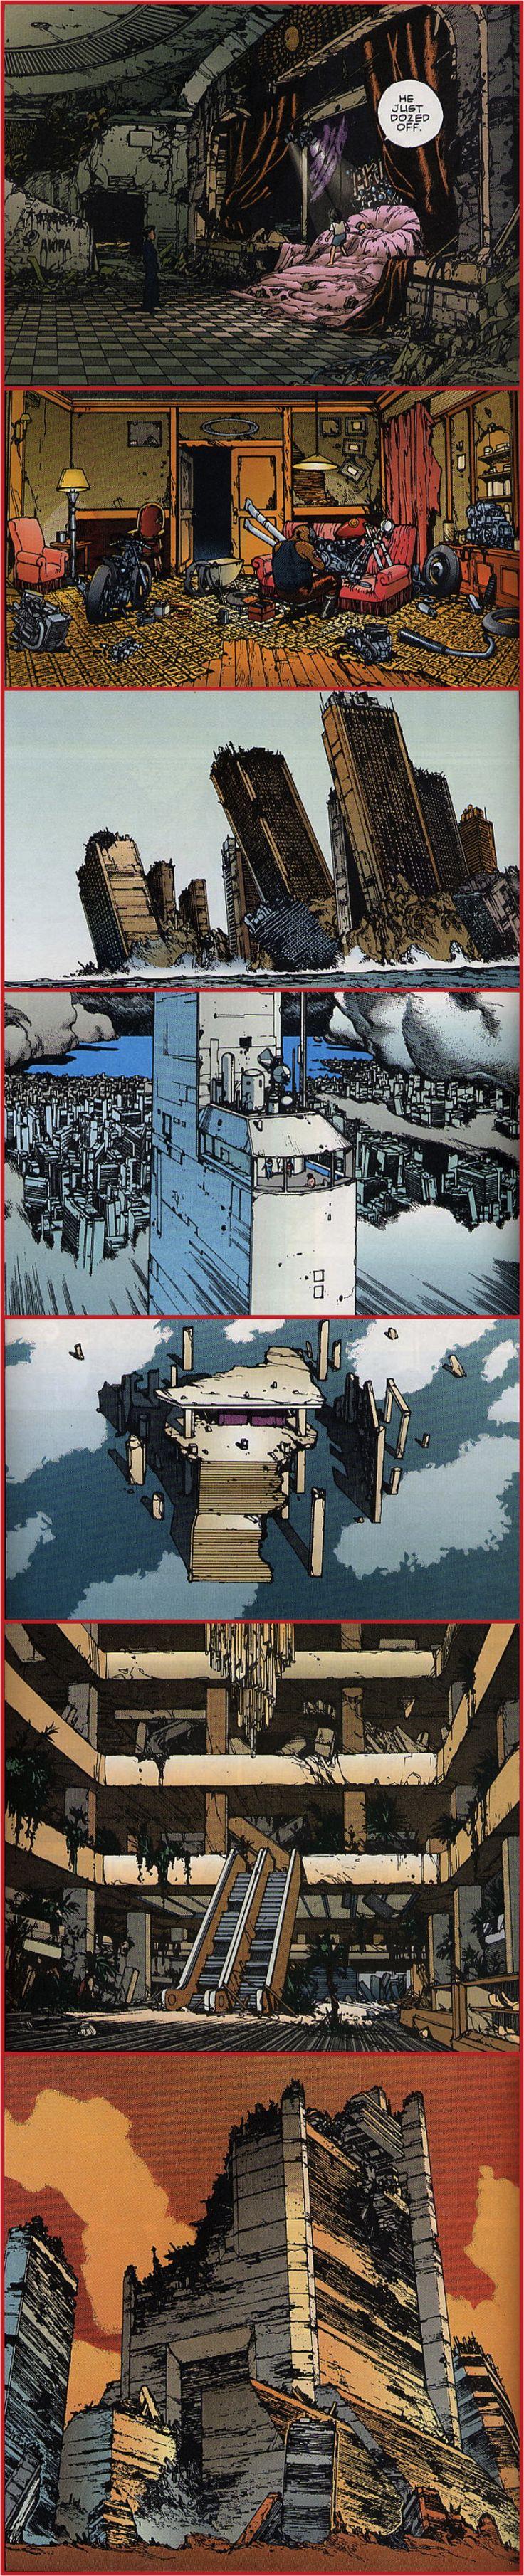 "Architecture and cityscapes from Katsuhiro Otomo's ""Akira"""